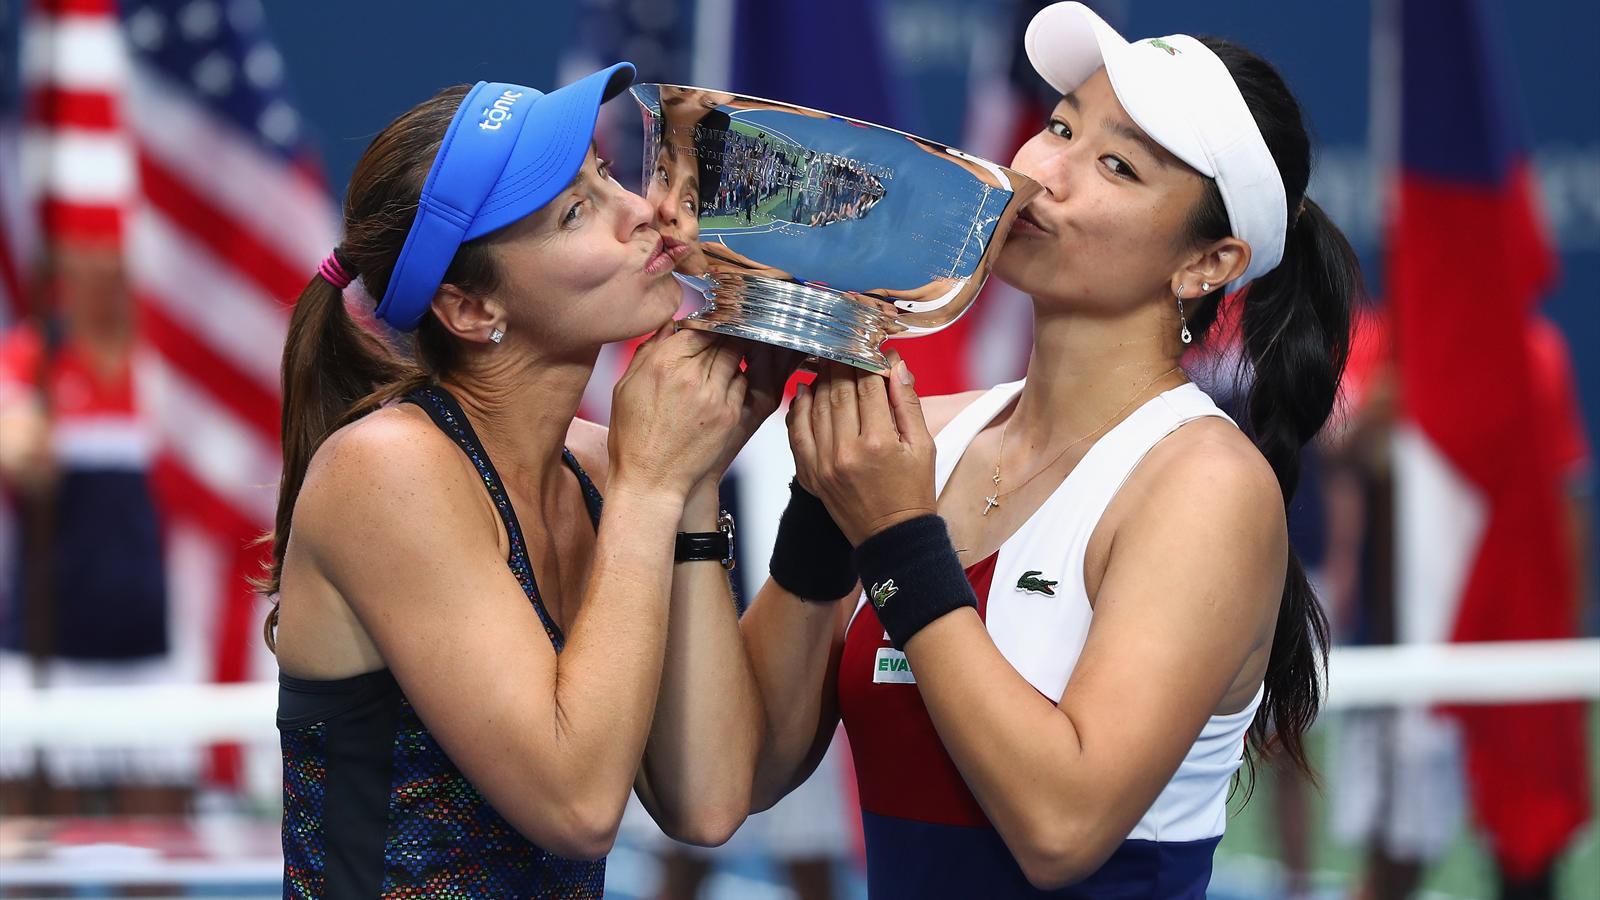 Watch Martina Hingis 5 Grand Slam singles titles video